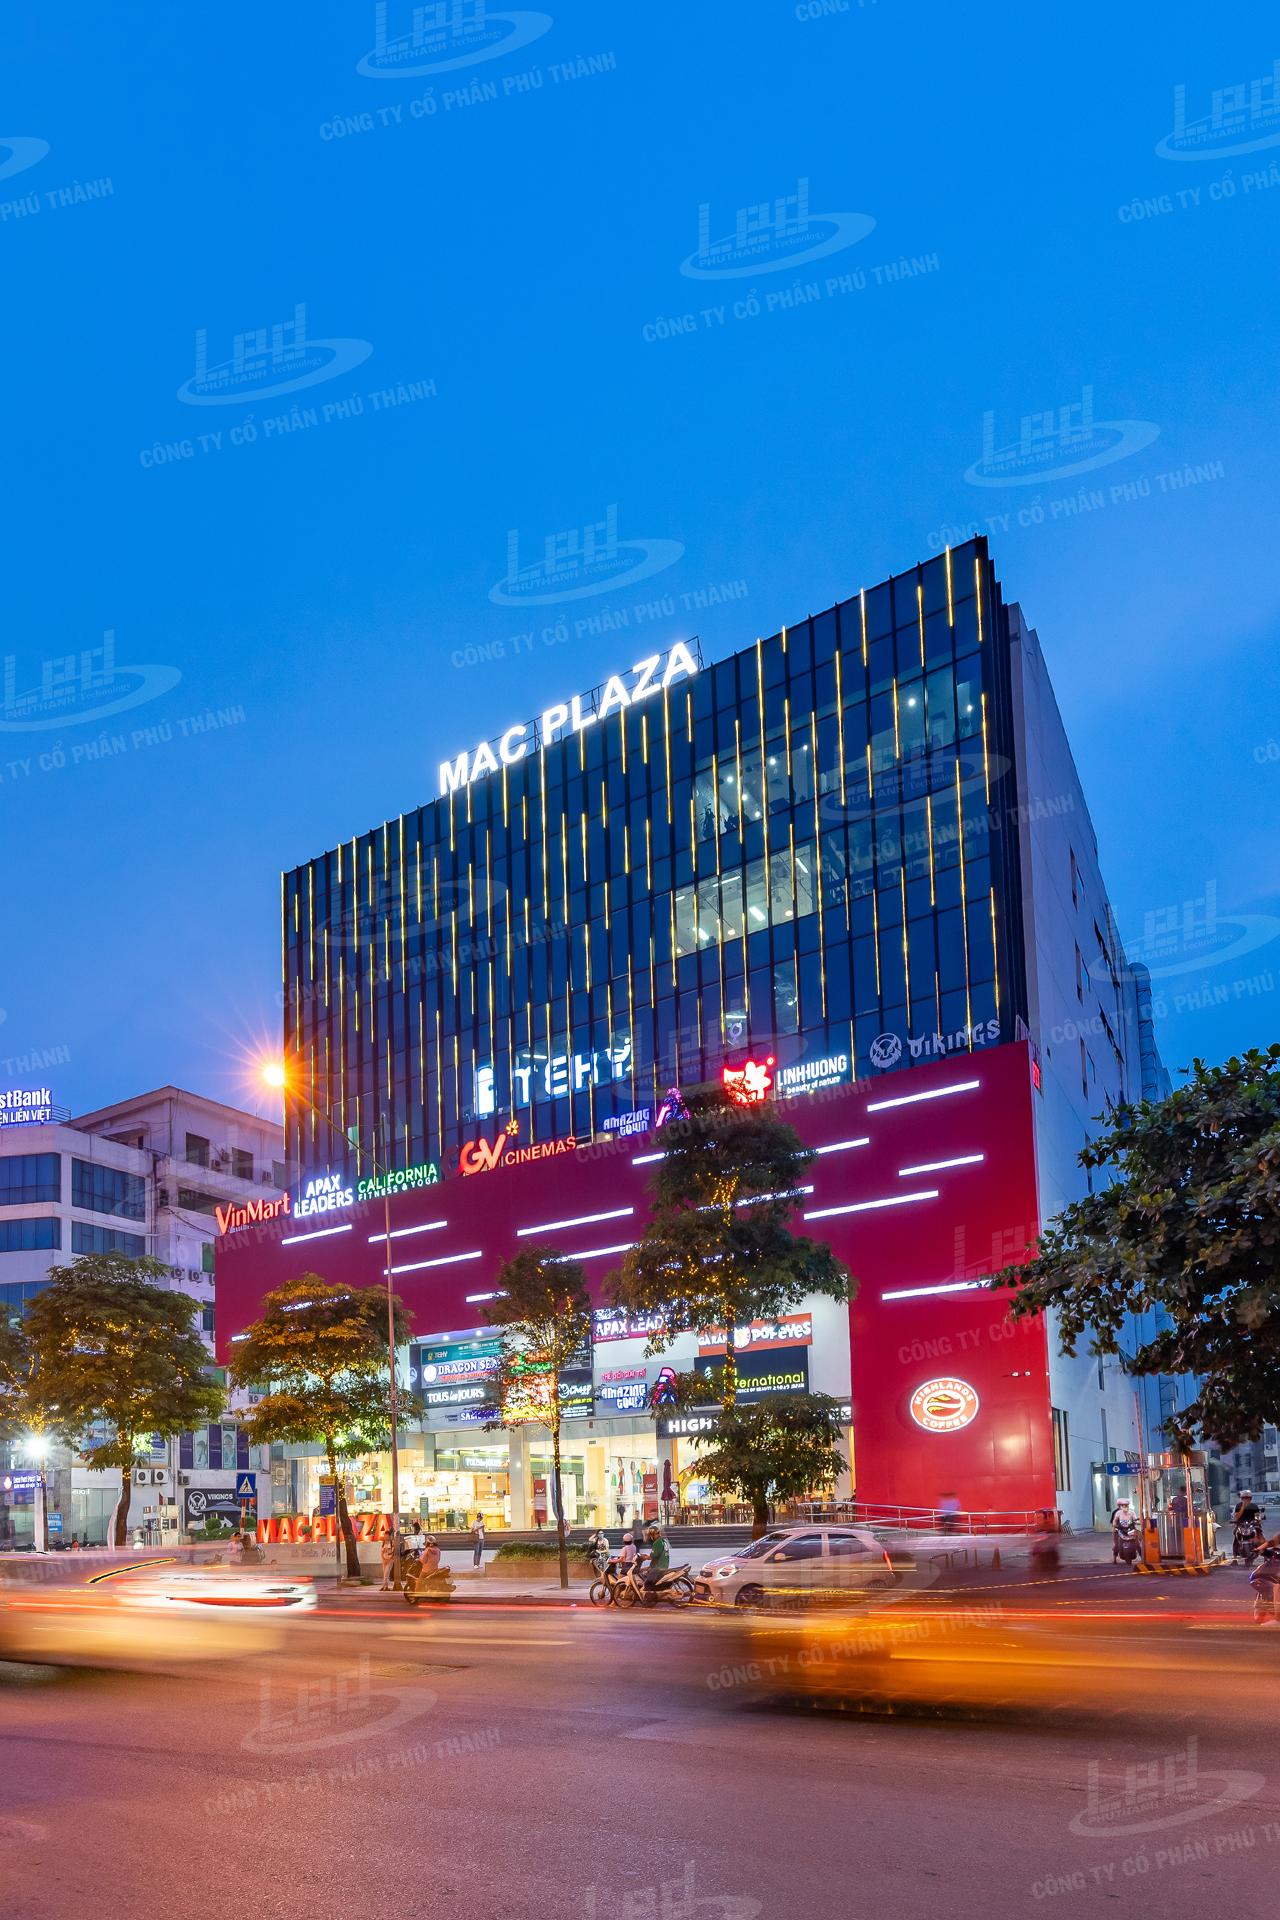 Mac-Plaza-05